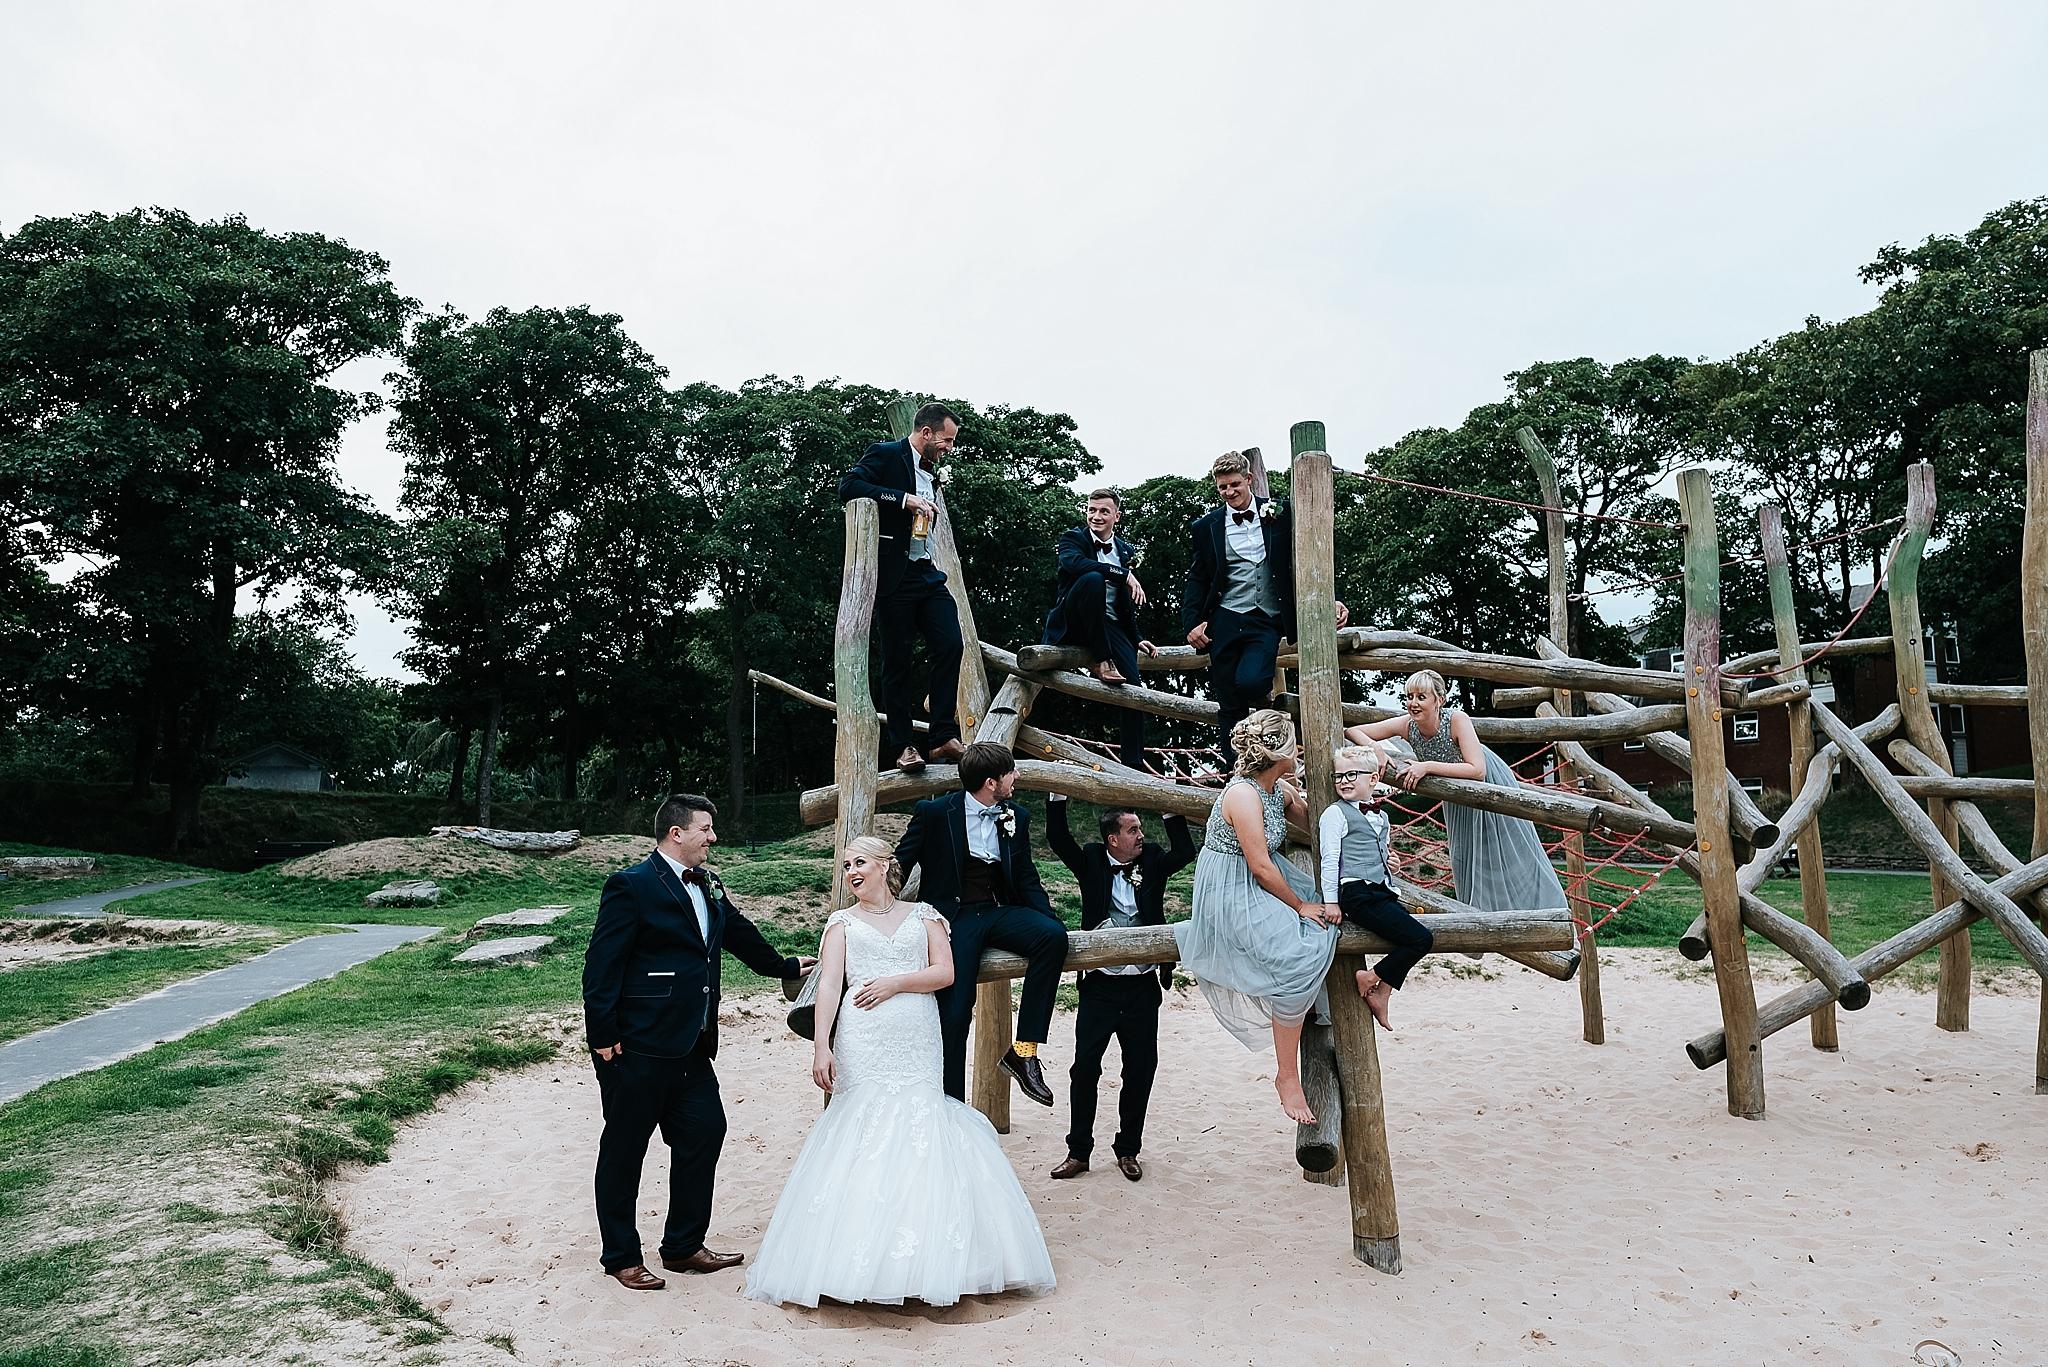 bridal group pictures in ashton park, st annes